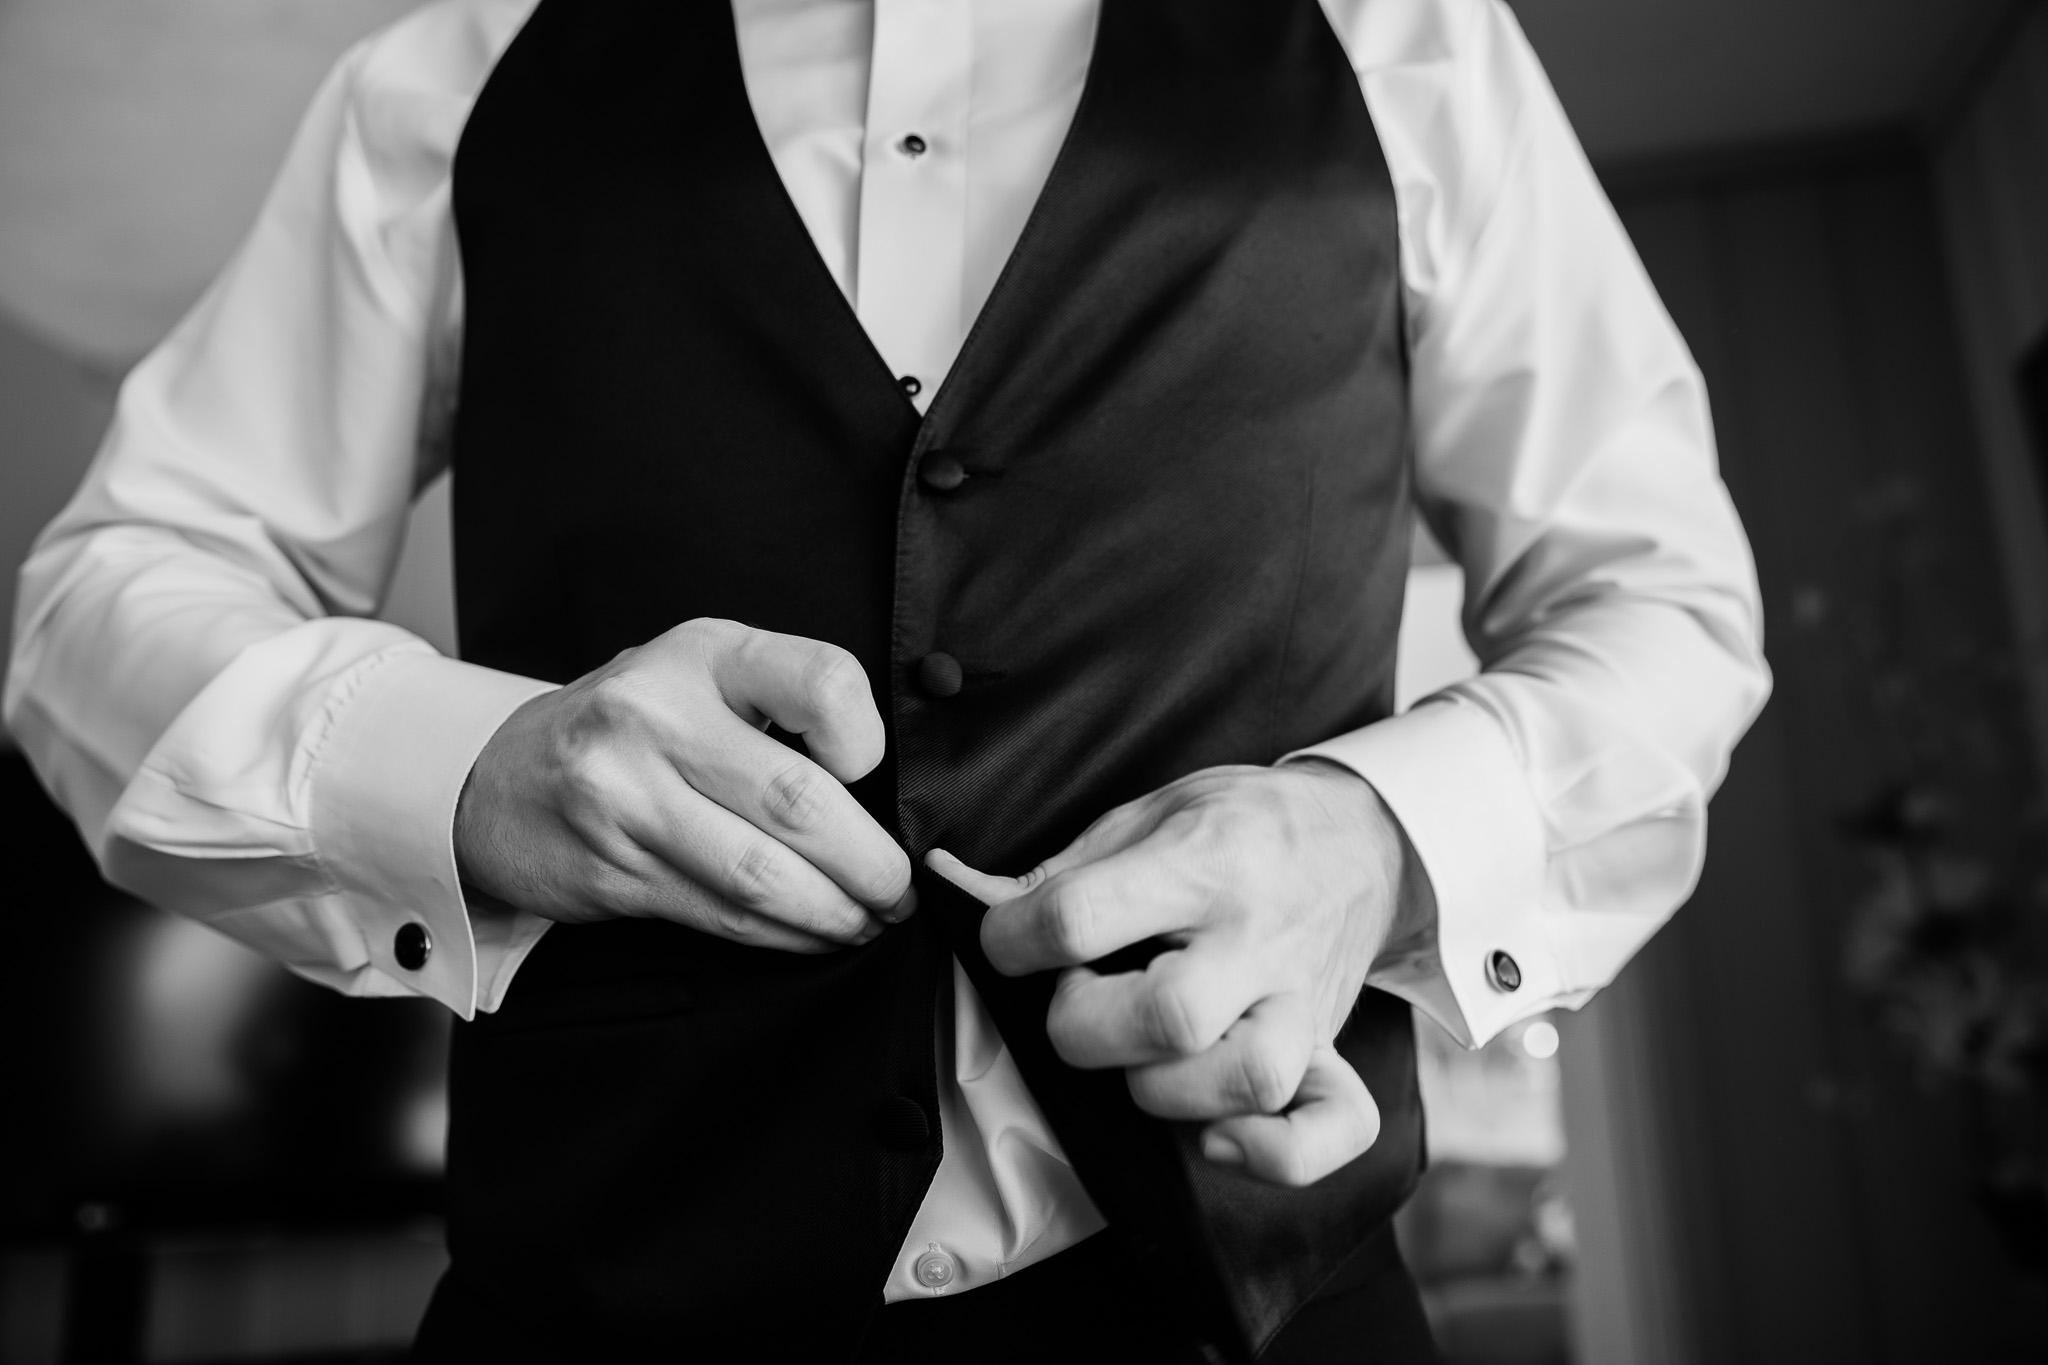 TAMPA_WEDDING_PHOTOGRAPHER_MPMZ_TJP49891_0006.jpg